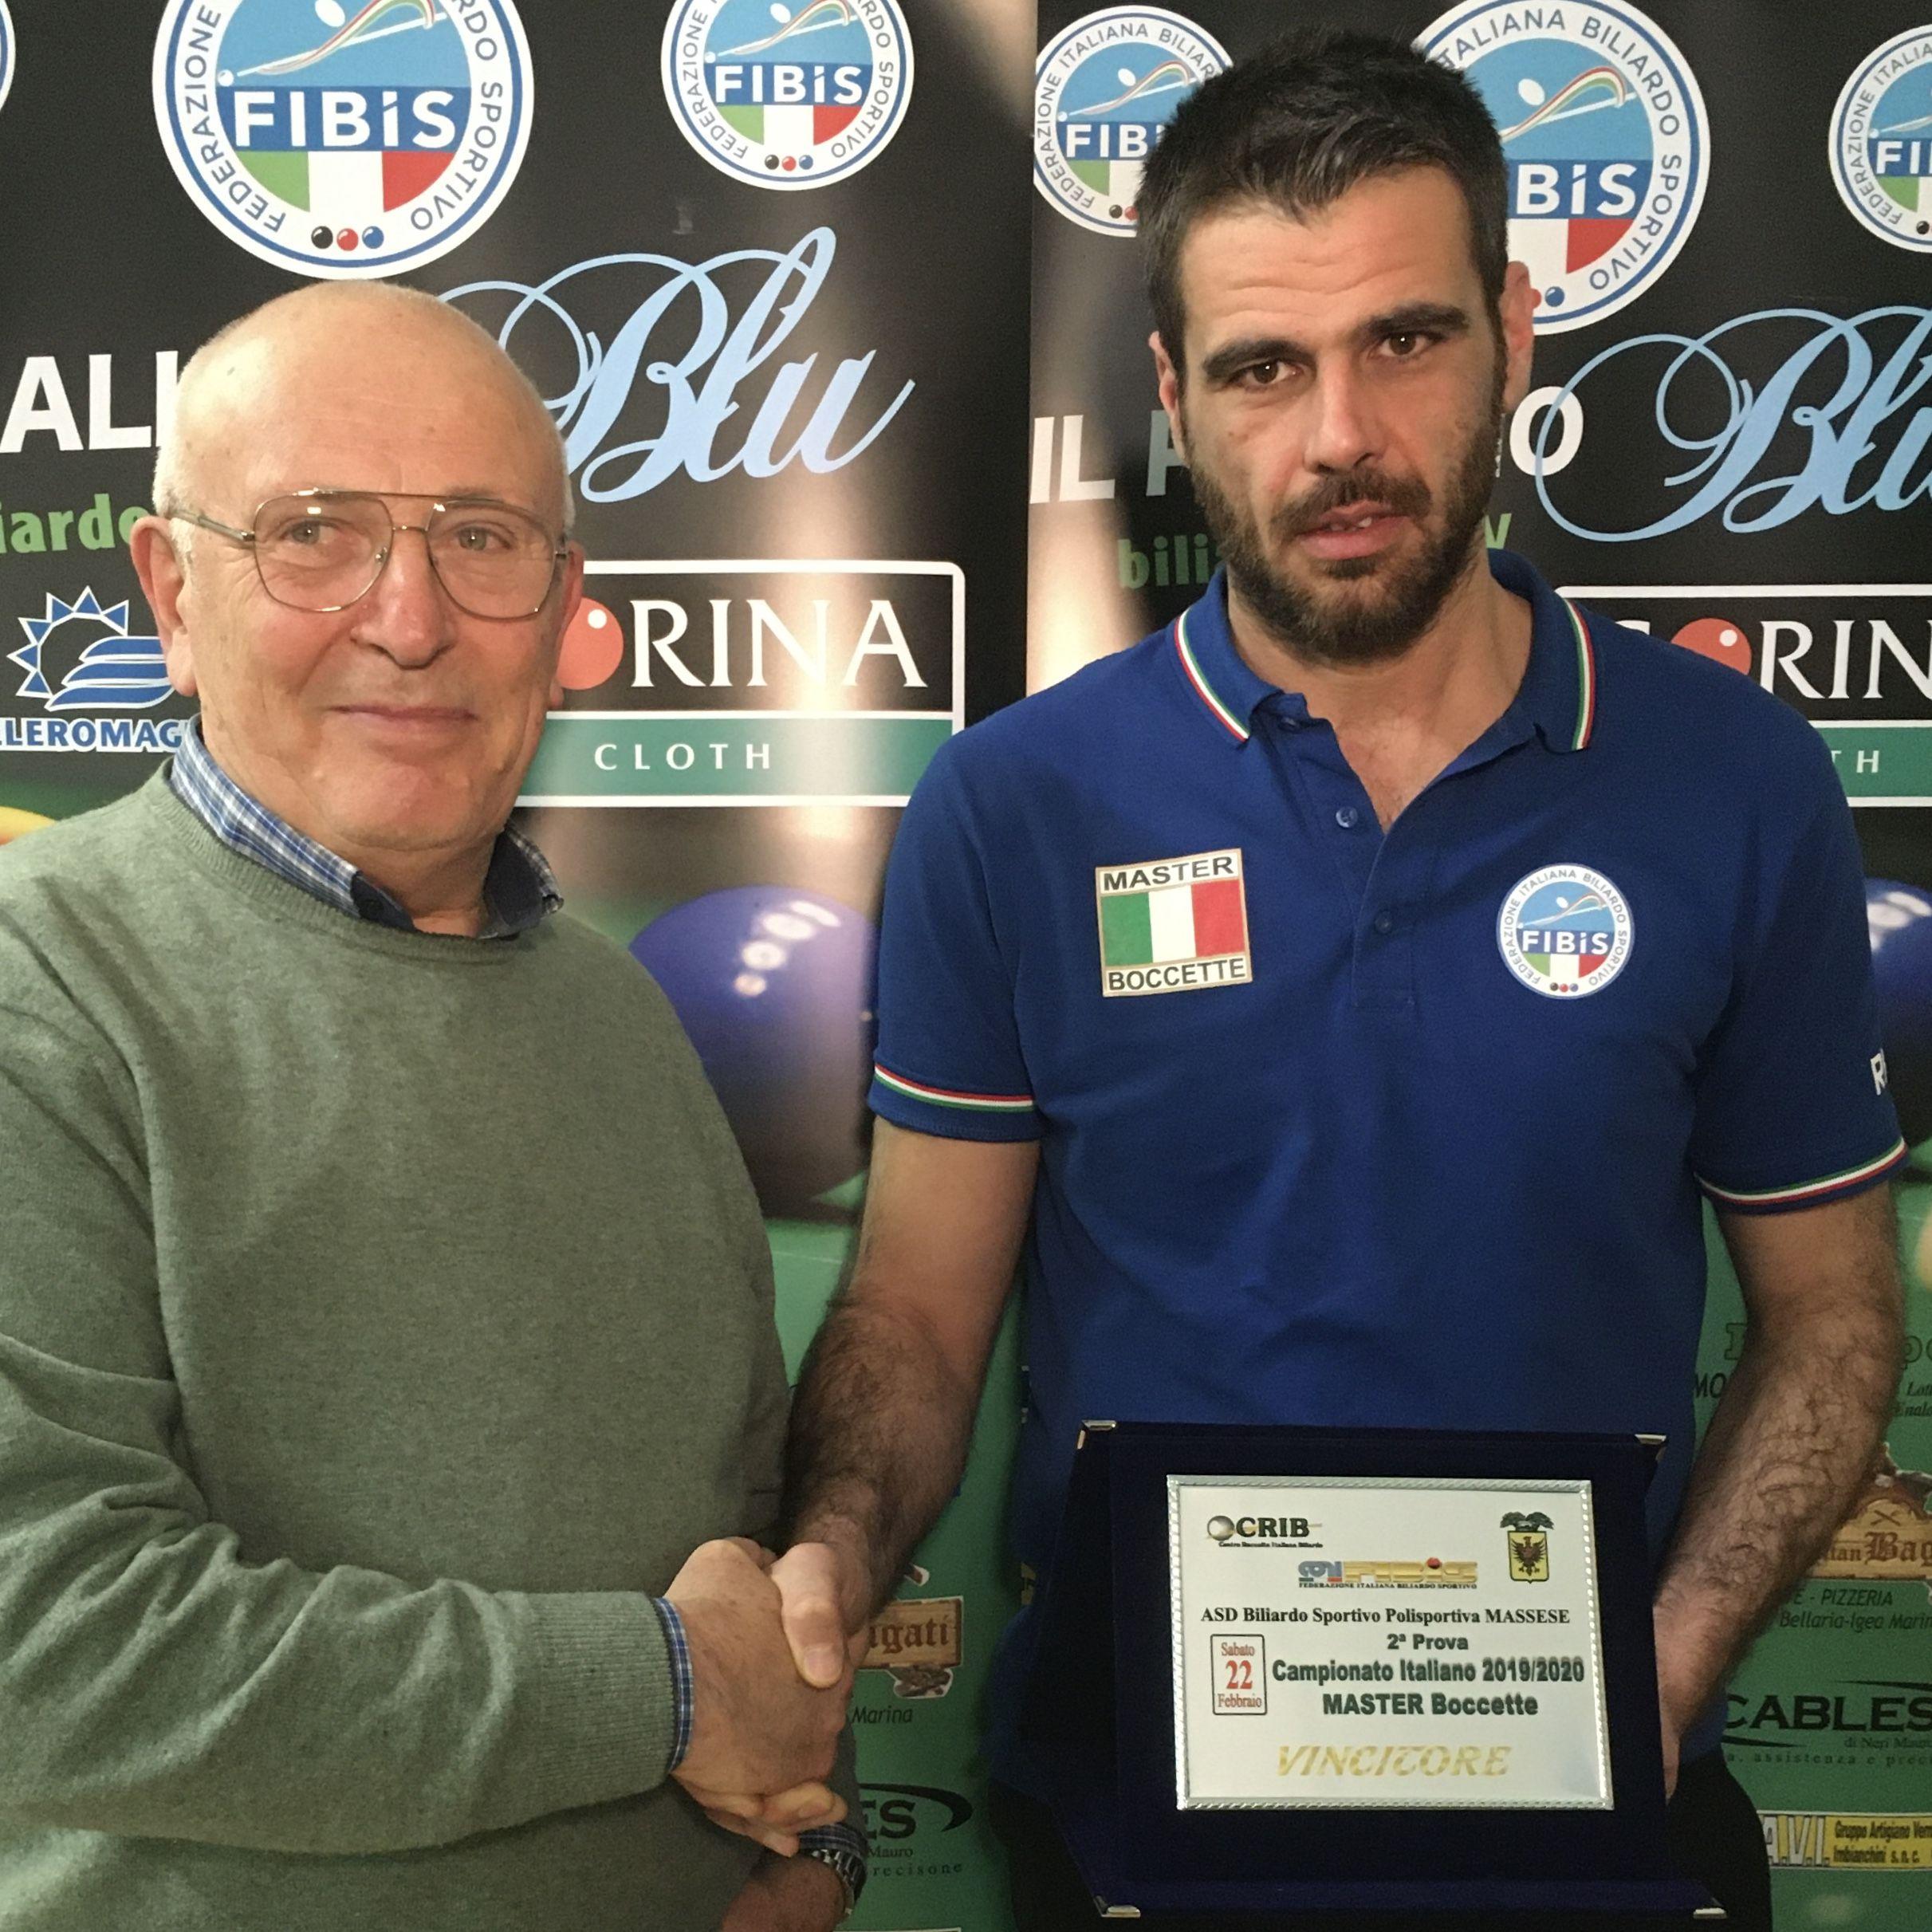 Giorgio Tavalazzi premia Daniele Ricci